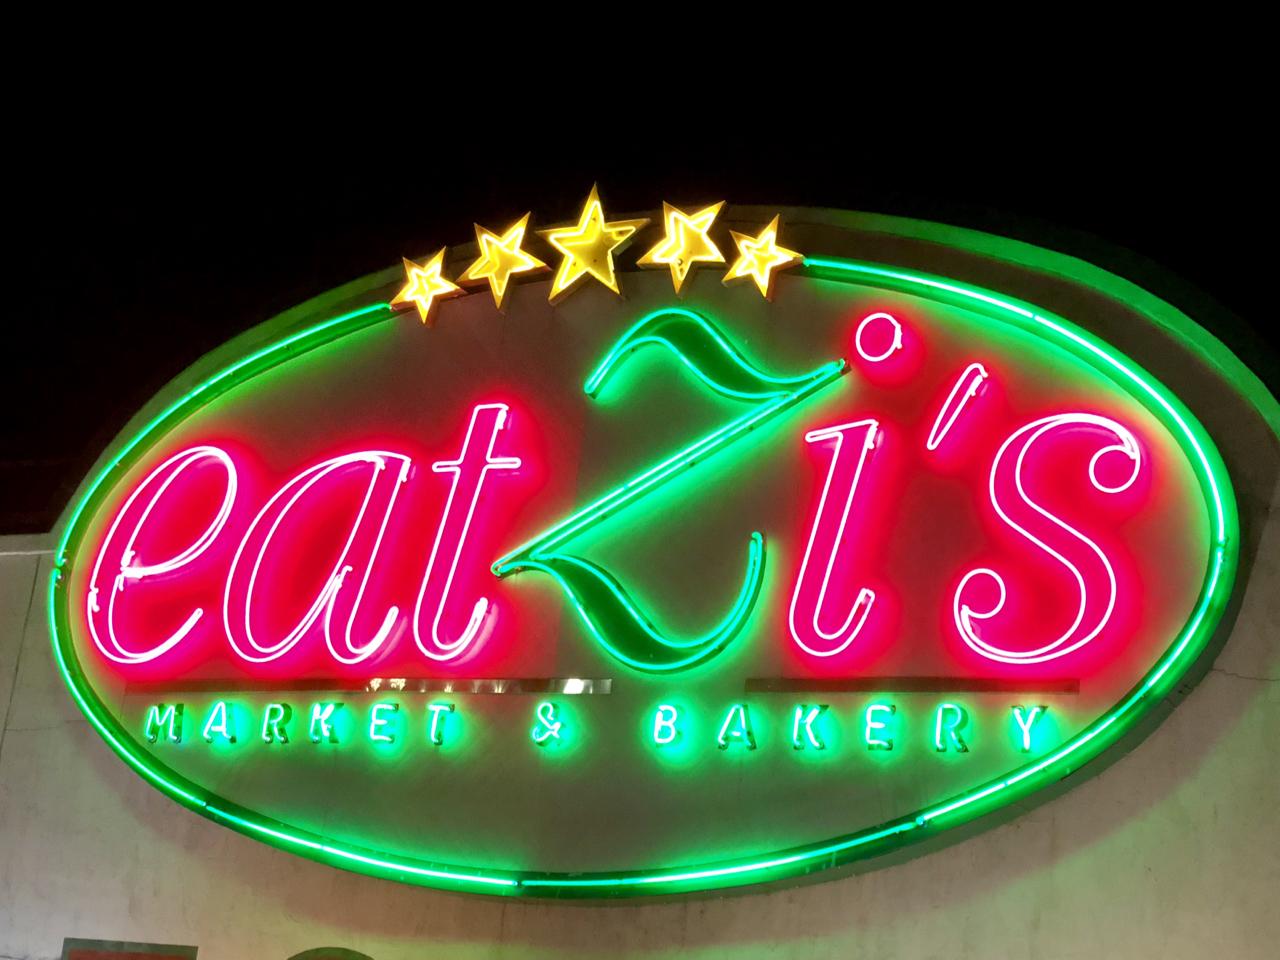 Status: Eatzi's